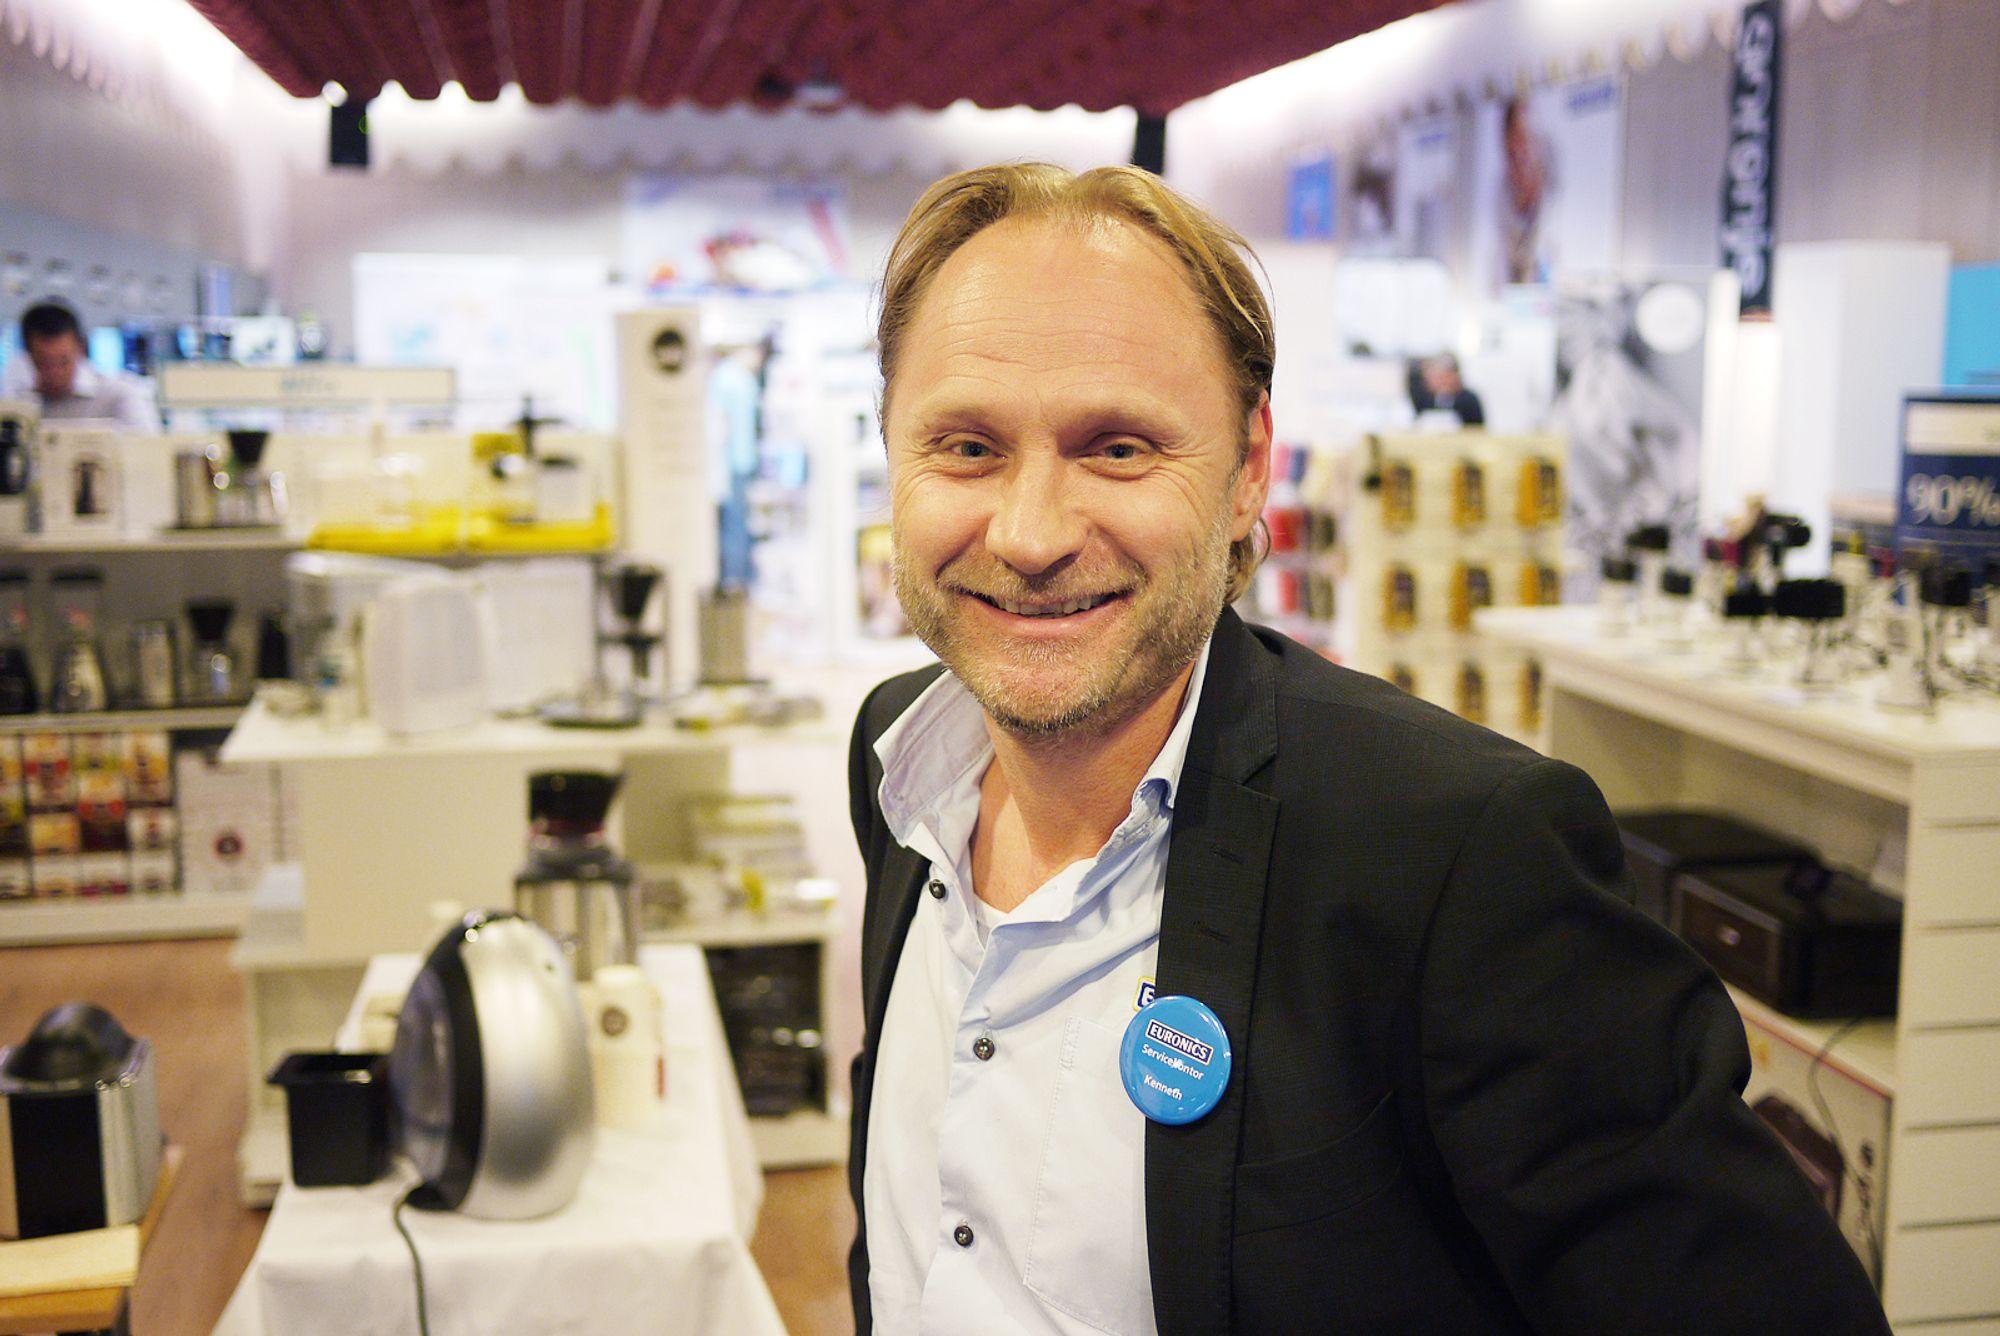 Kenneth Baltzersen, kjedeleder i Euronics Norge, så kraftig øktning i dab-salget denne Black Friday.